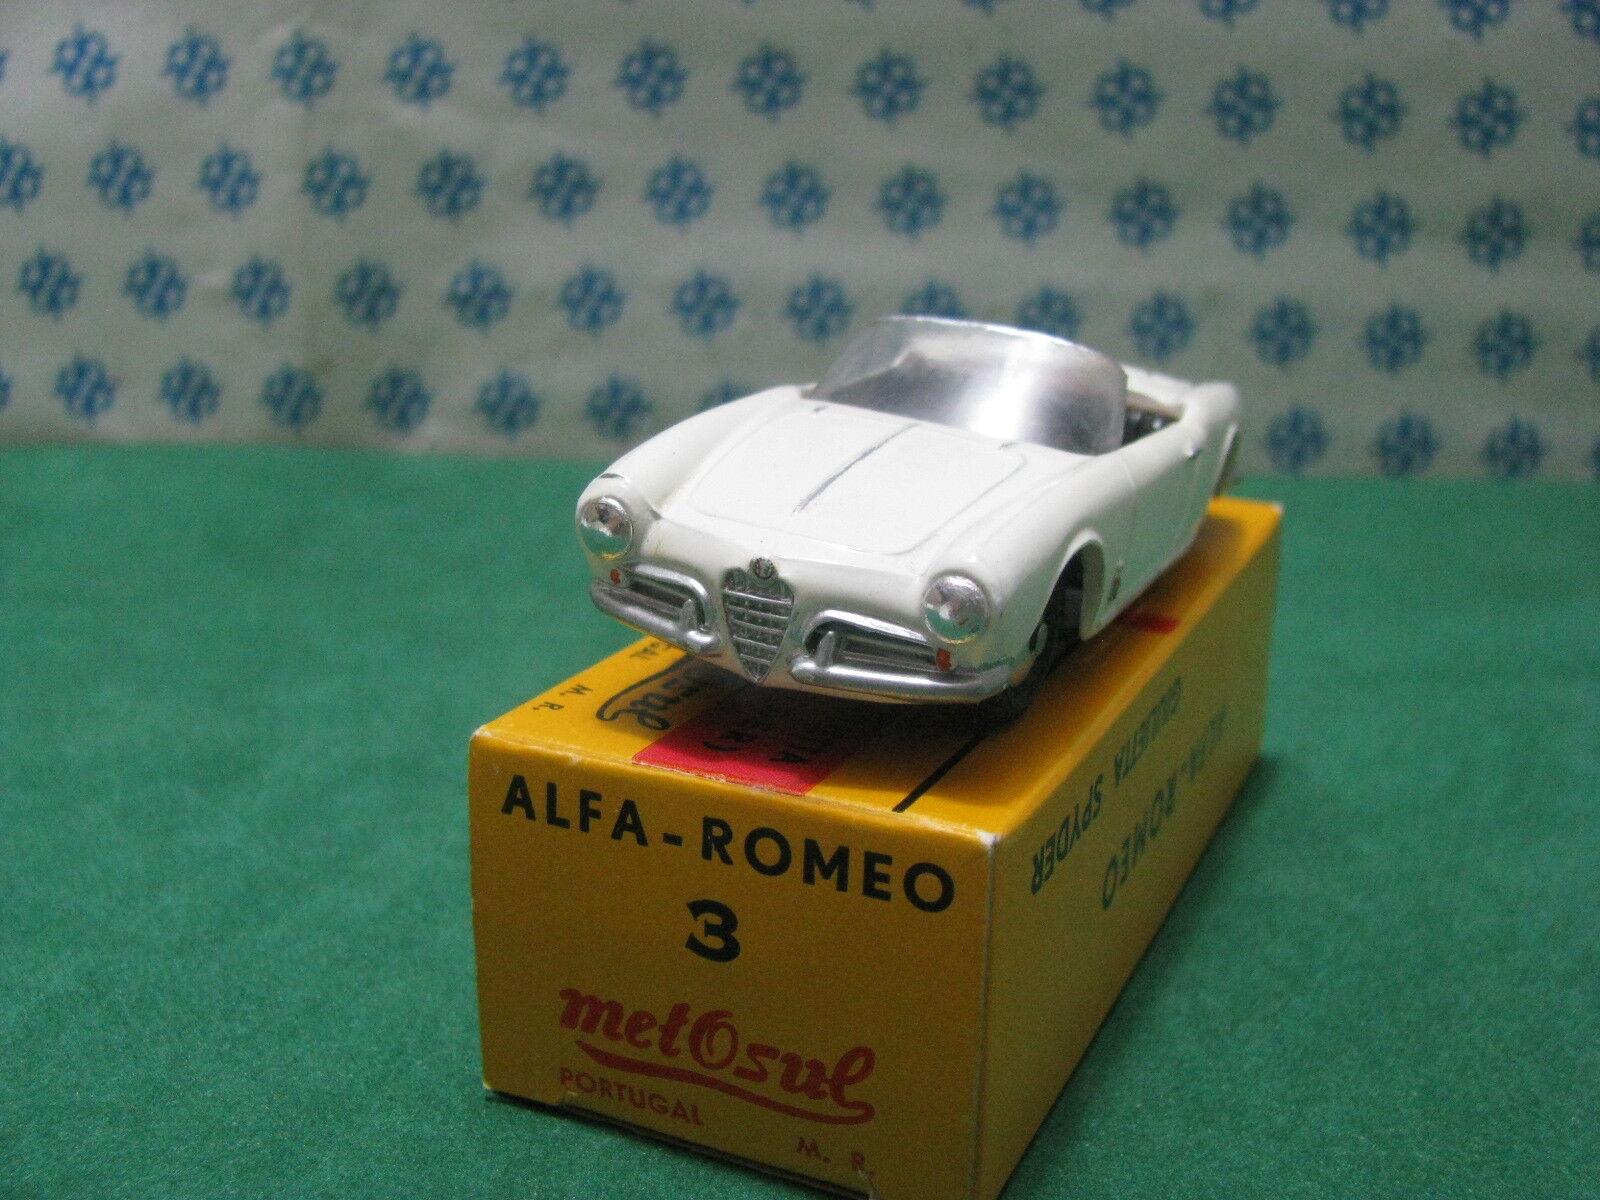 Vintage  -  ALFA ROMEO Giulietta Spyder    - 1 43 Metosul n°3